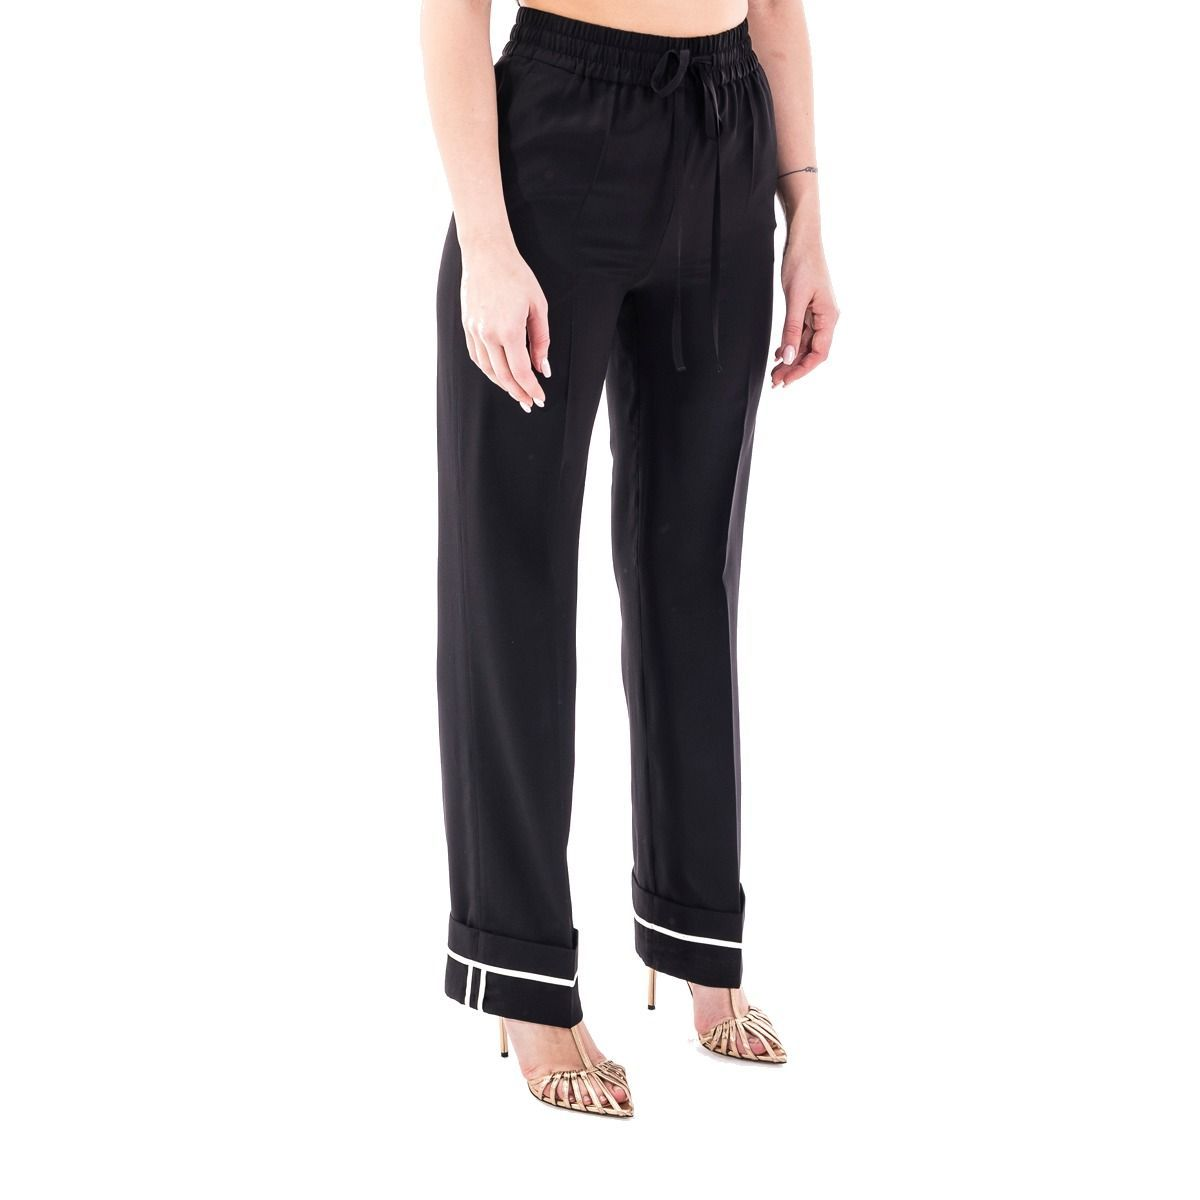 RED VALENTINO WOMEN'S TR0RBC2023H0NO BLACK SILK PANTS